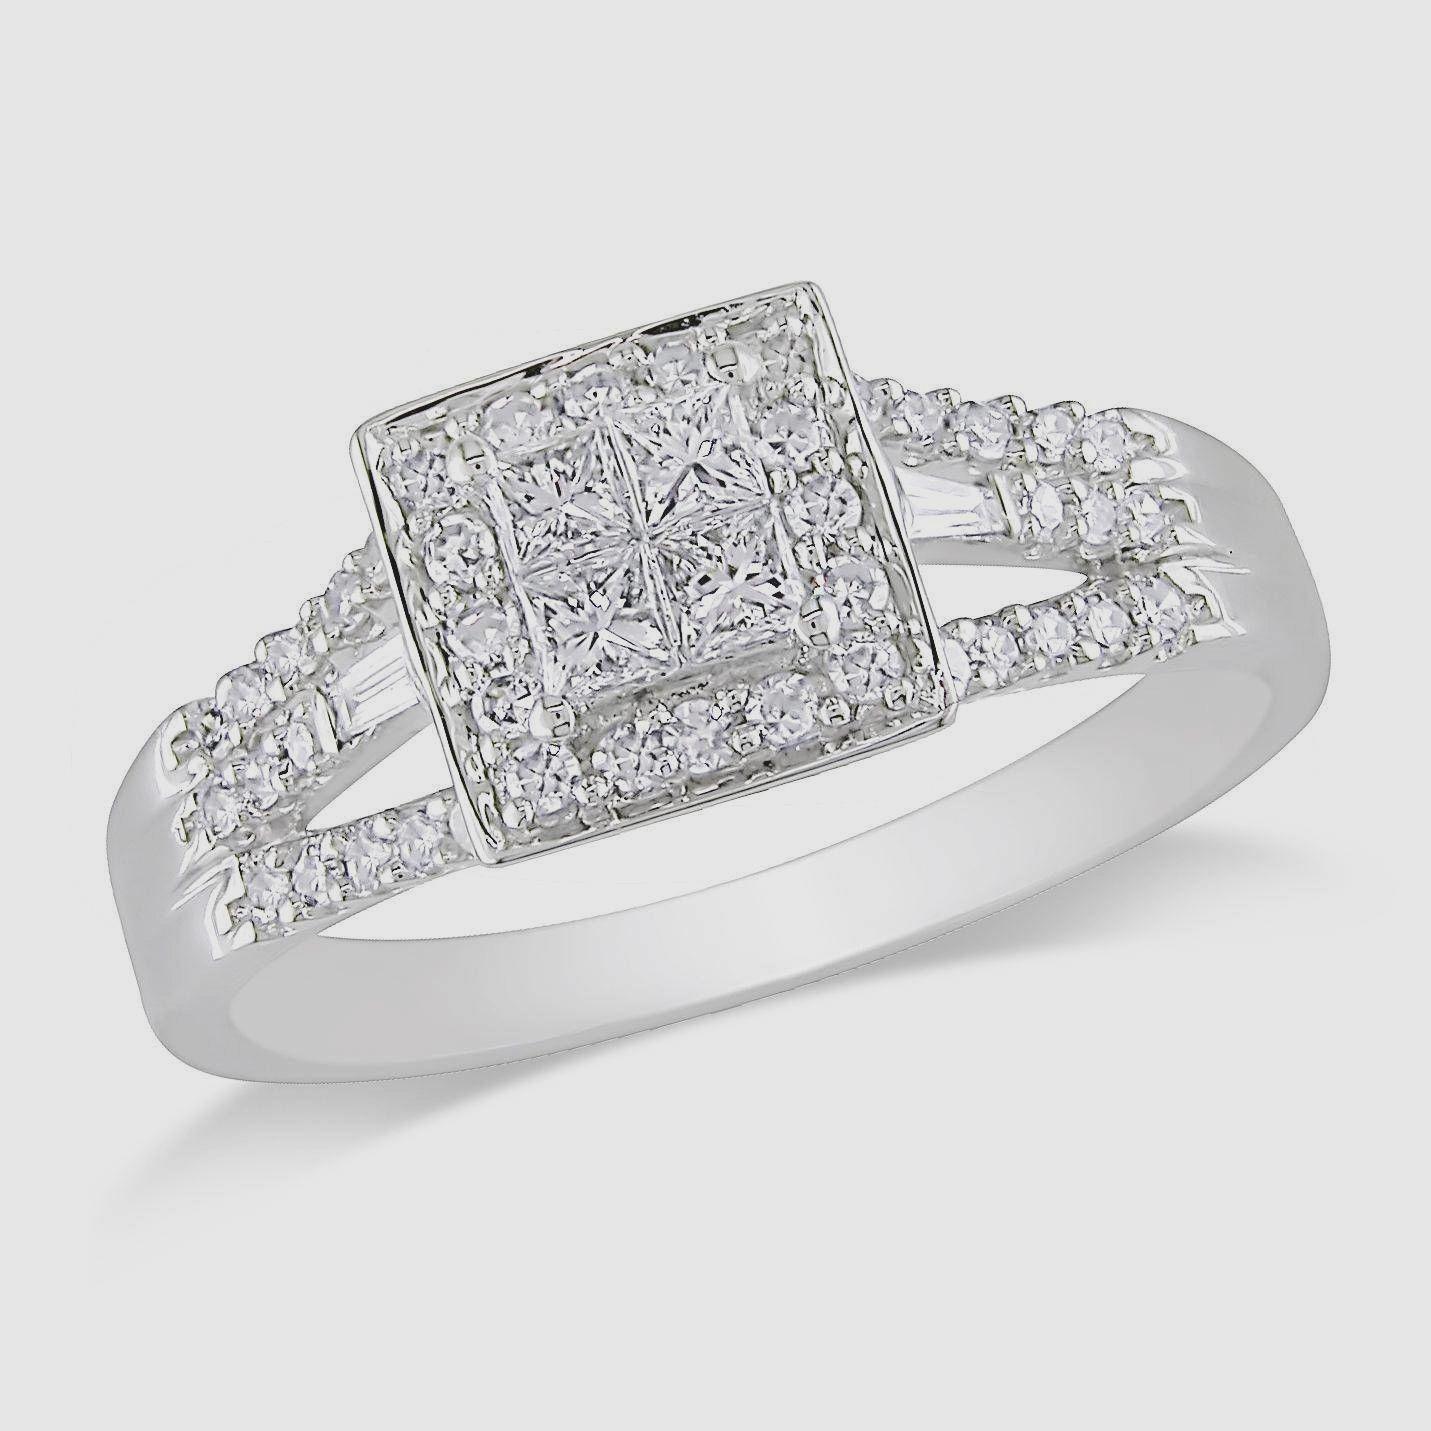 Walmart White Gold Wedding Rings In 2020 White Gold Wedding Rings Gold Wedding Rings Elegant Wedding Rings